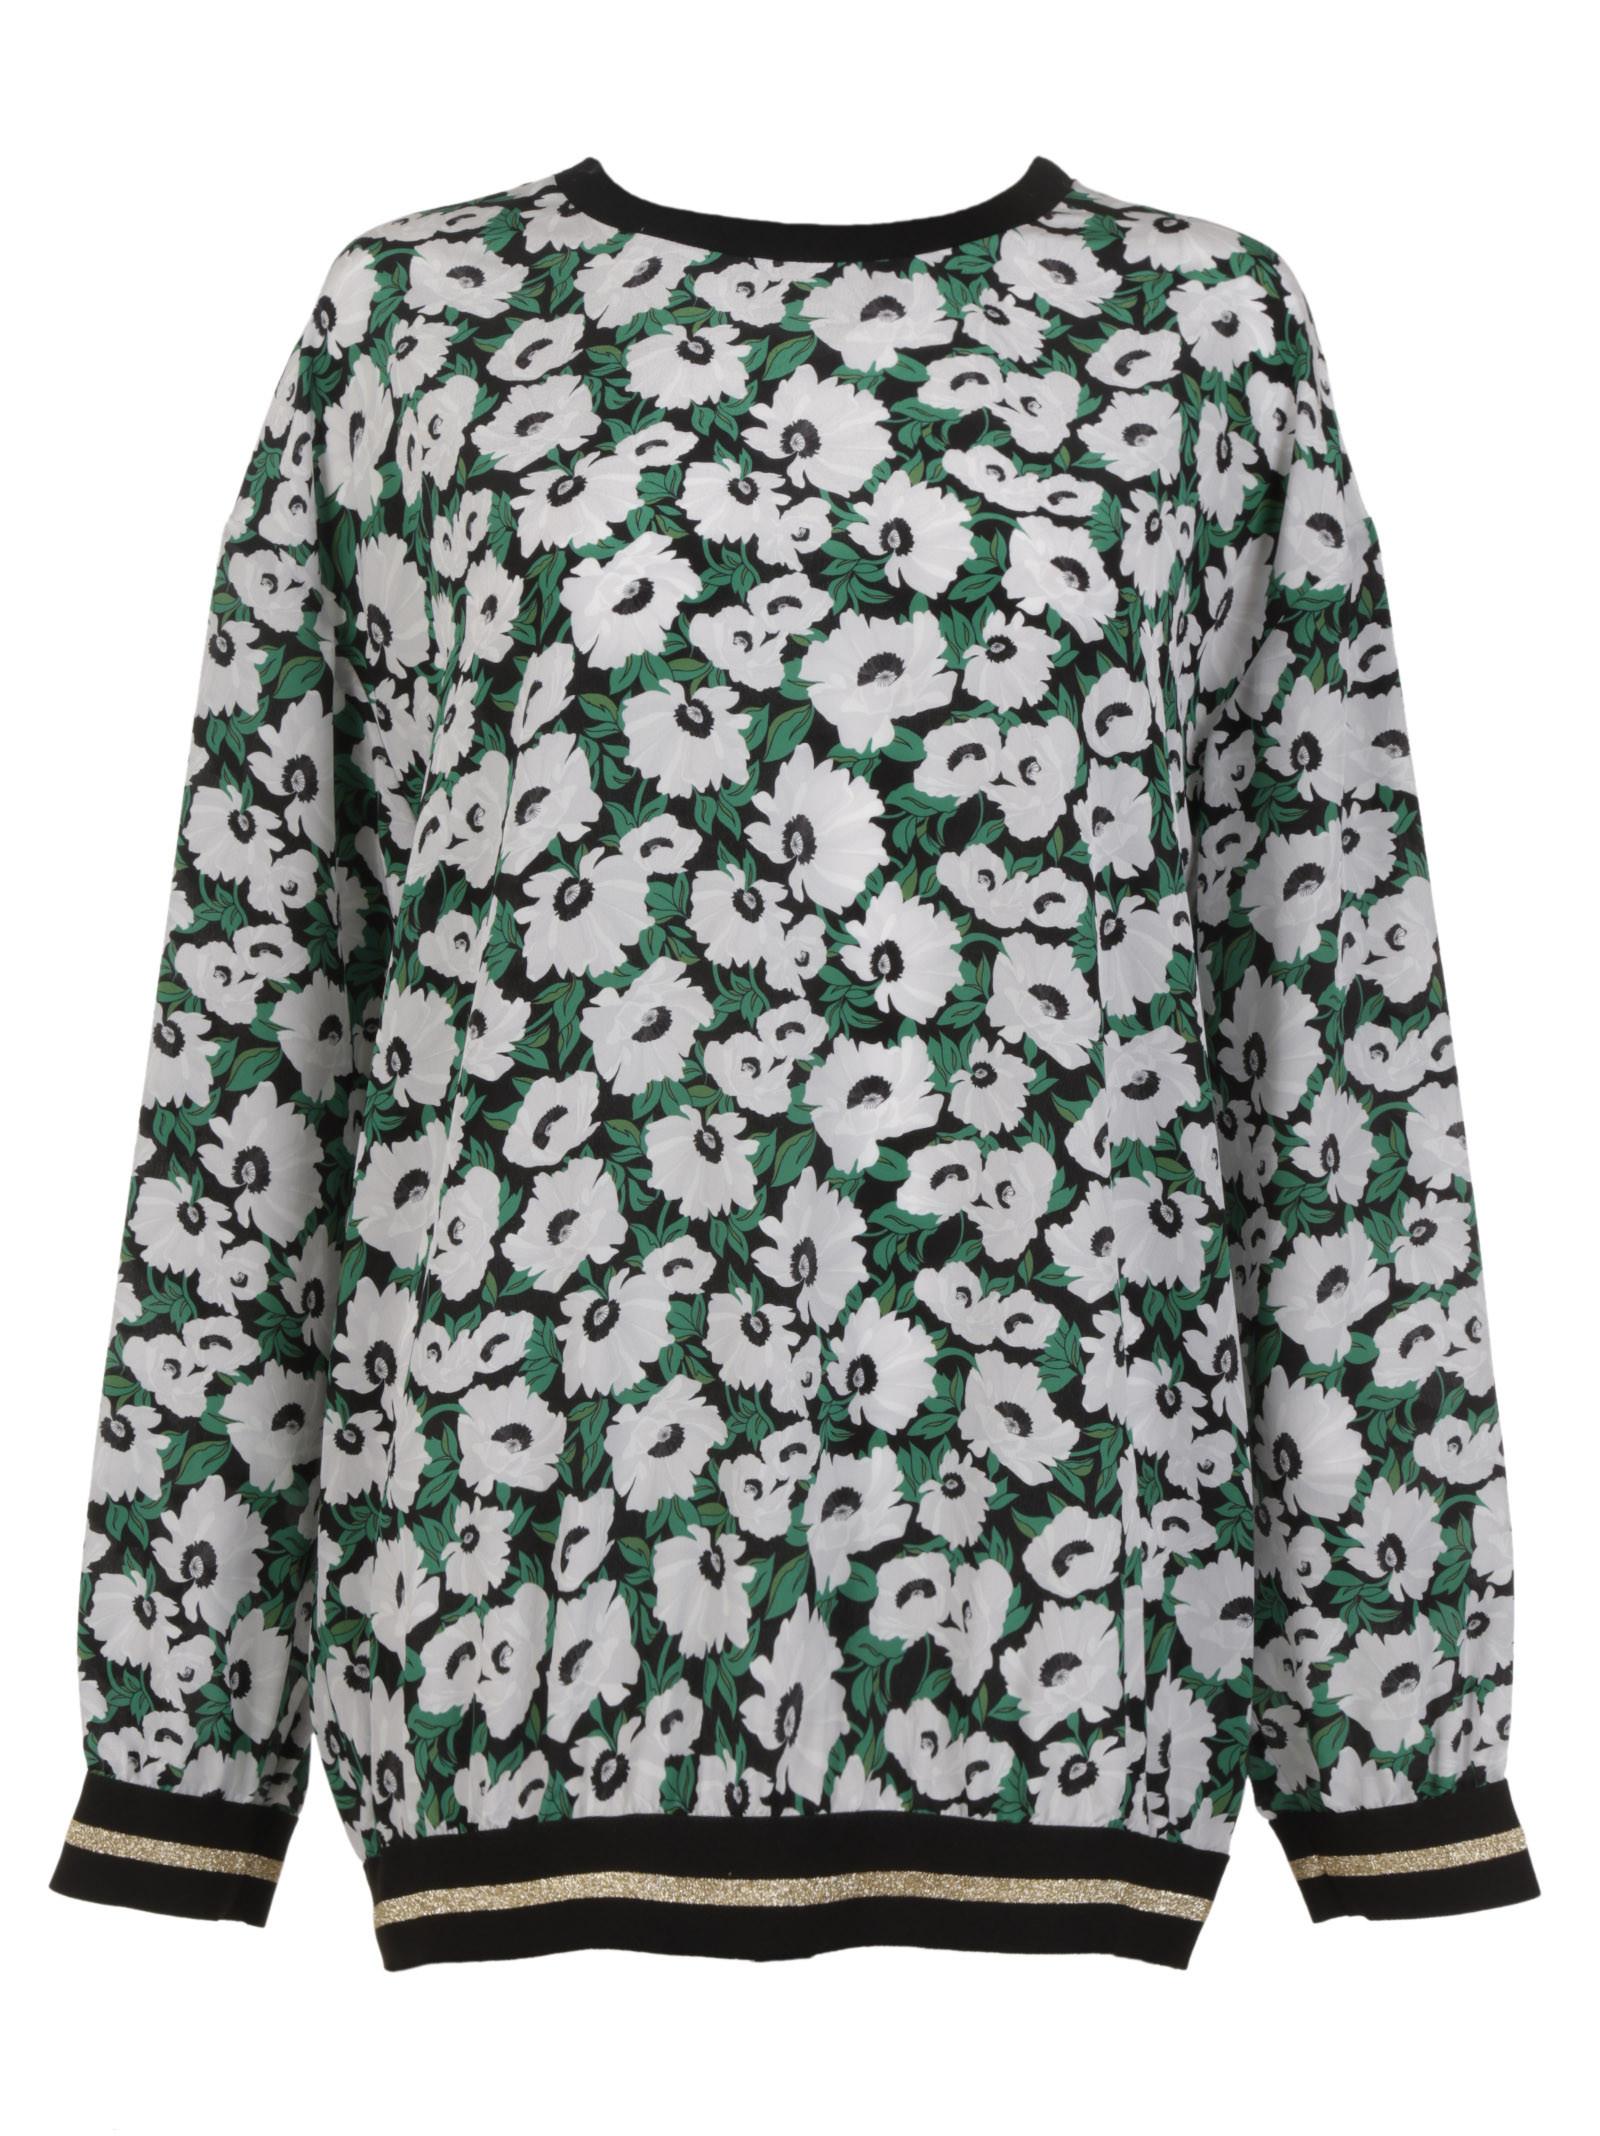 Stella McCartney Poppy Print Ines Sweatshirt - Stella McCartney - Hair